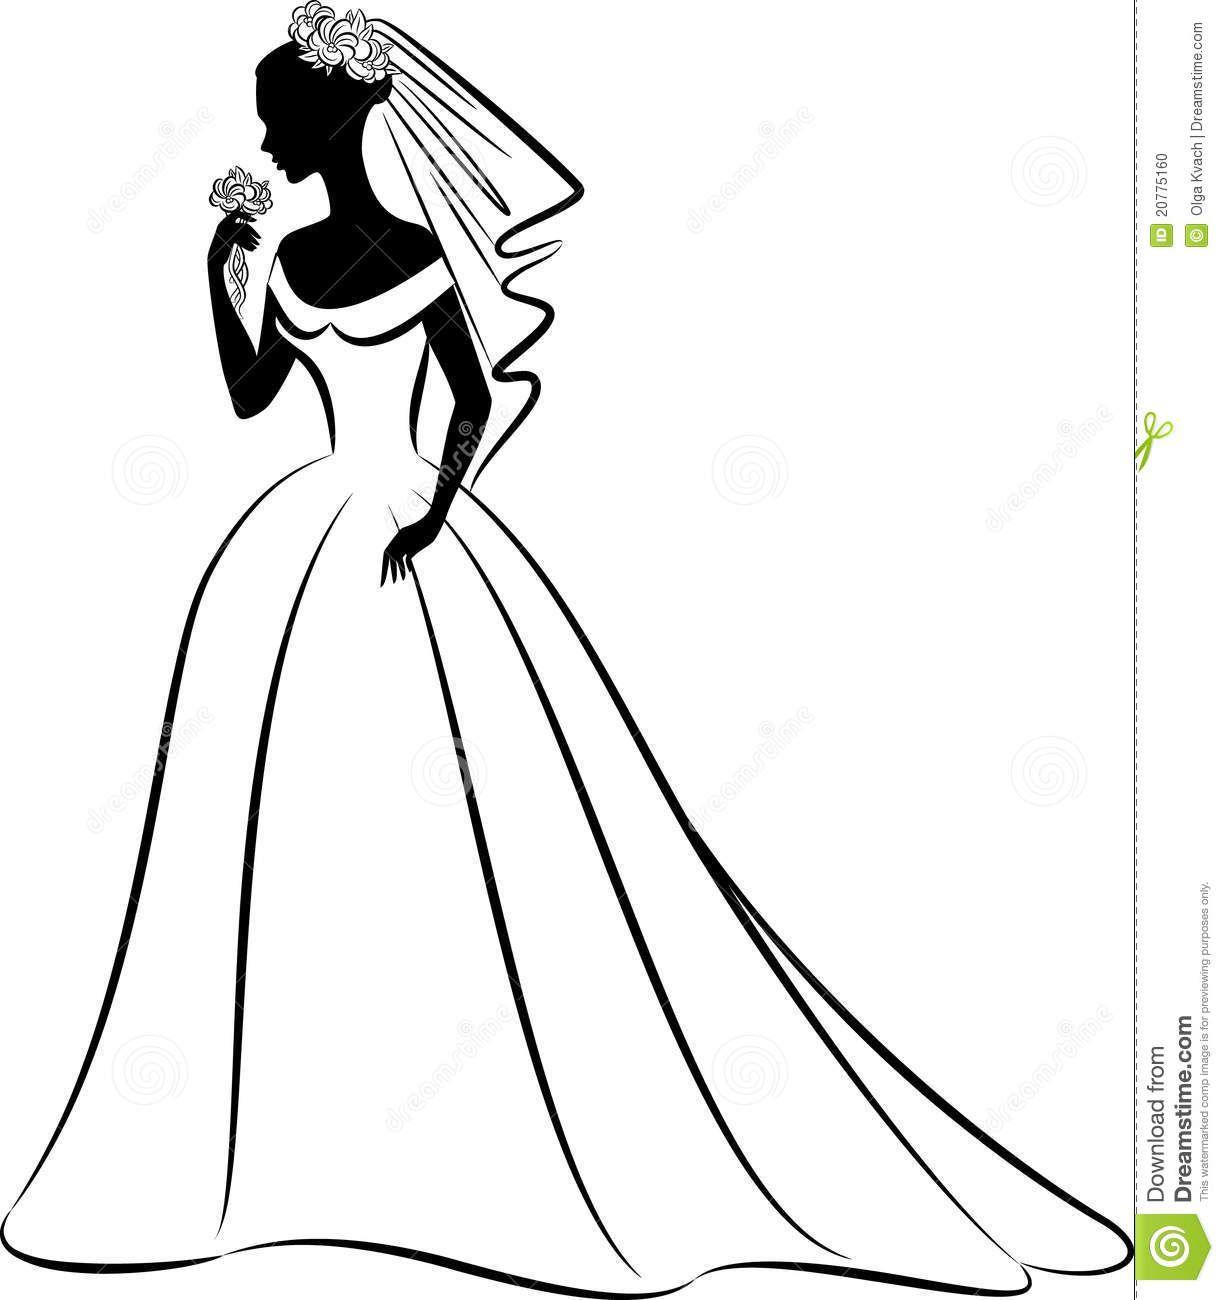 Bridesmaid Dress Silhouette Clip Art Clipart Panda Free.